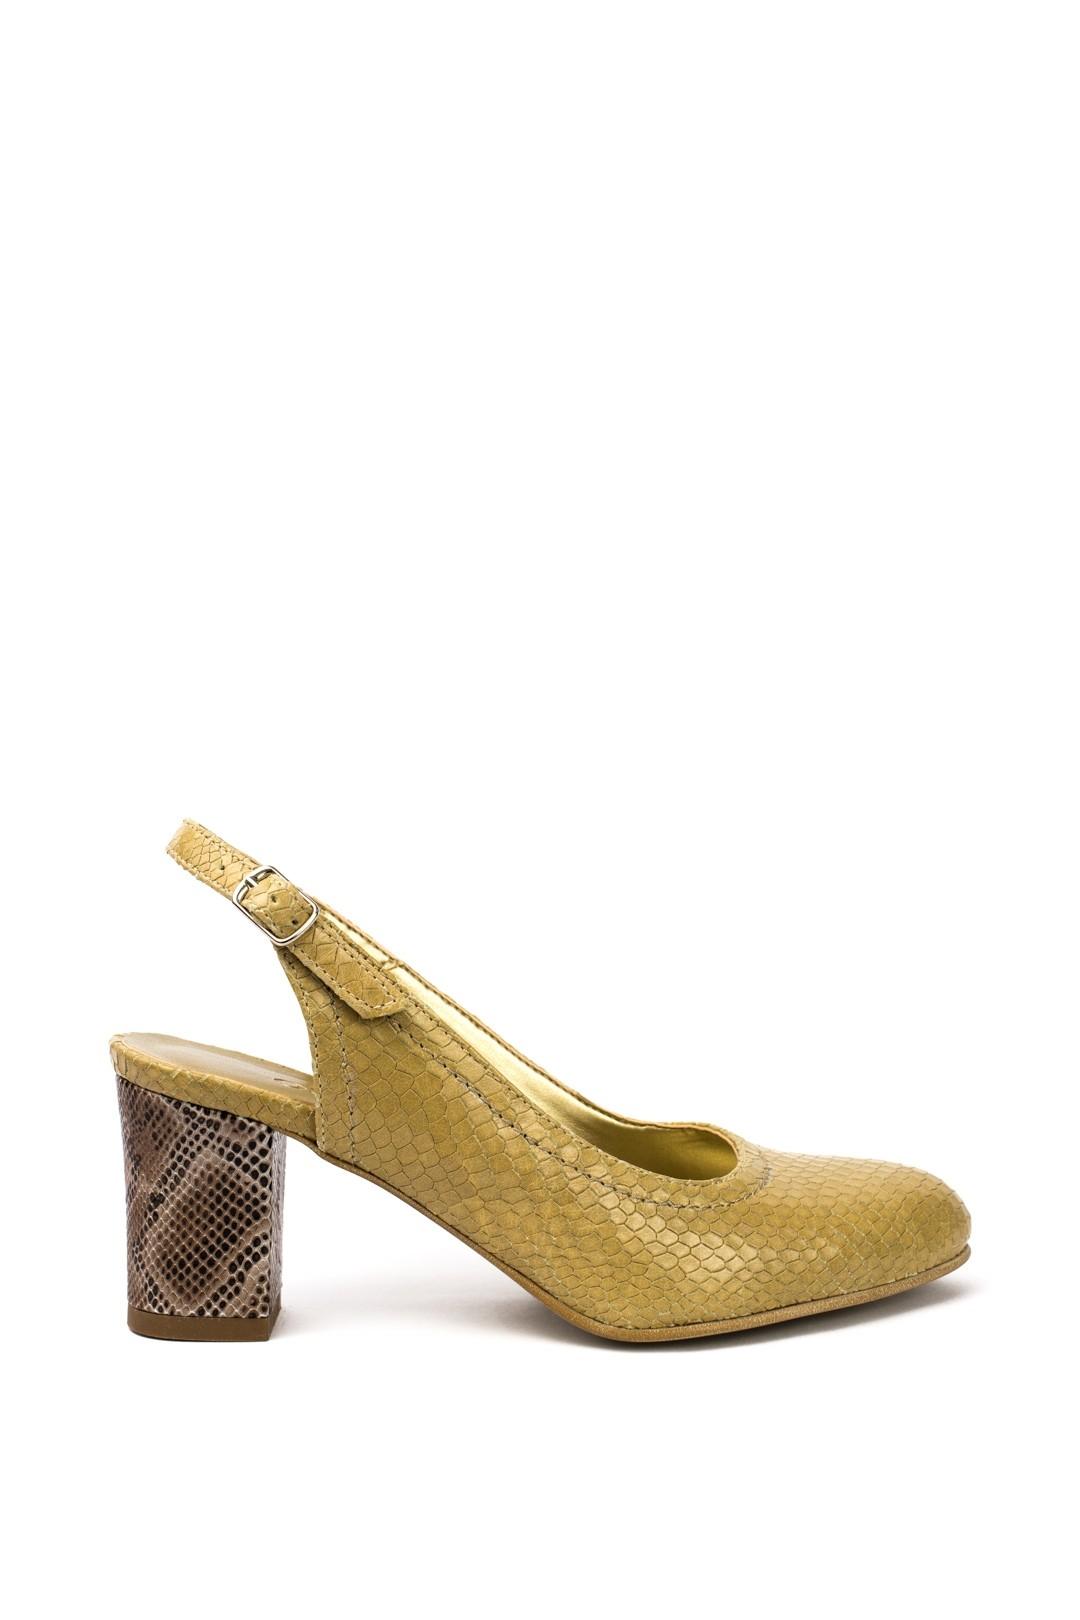 Sandale Dama piele naturala bej Steluta